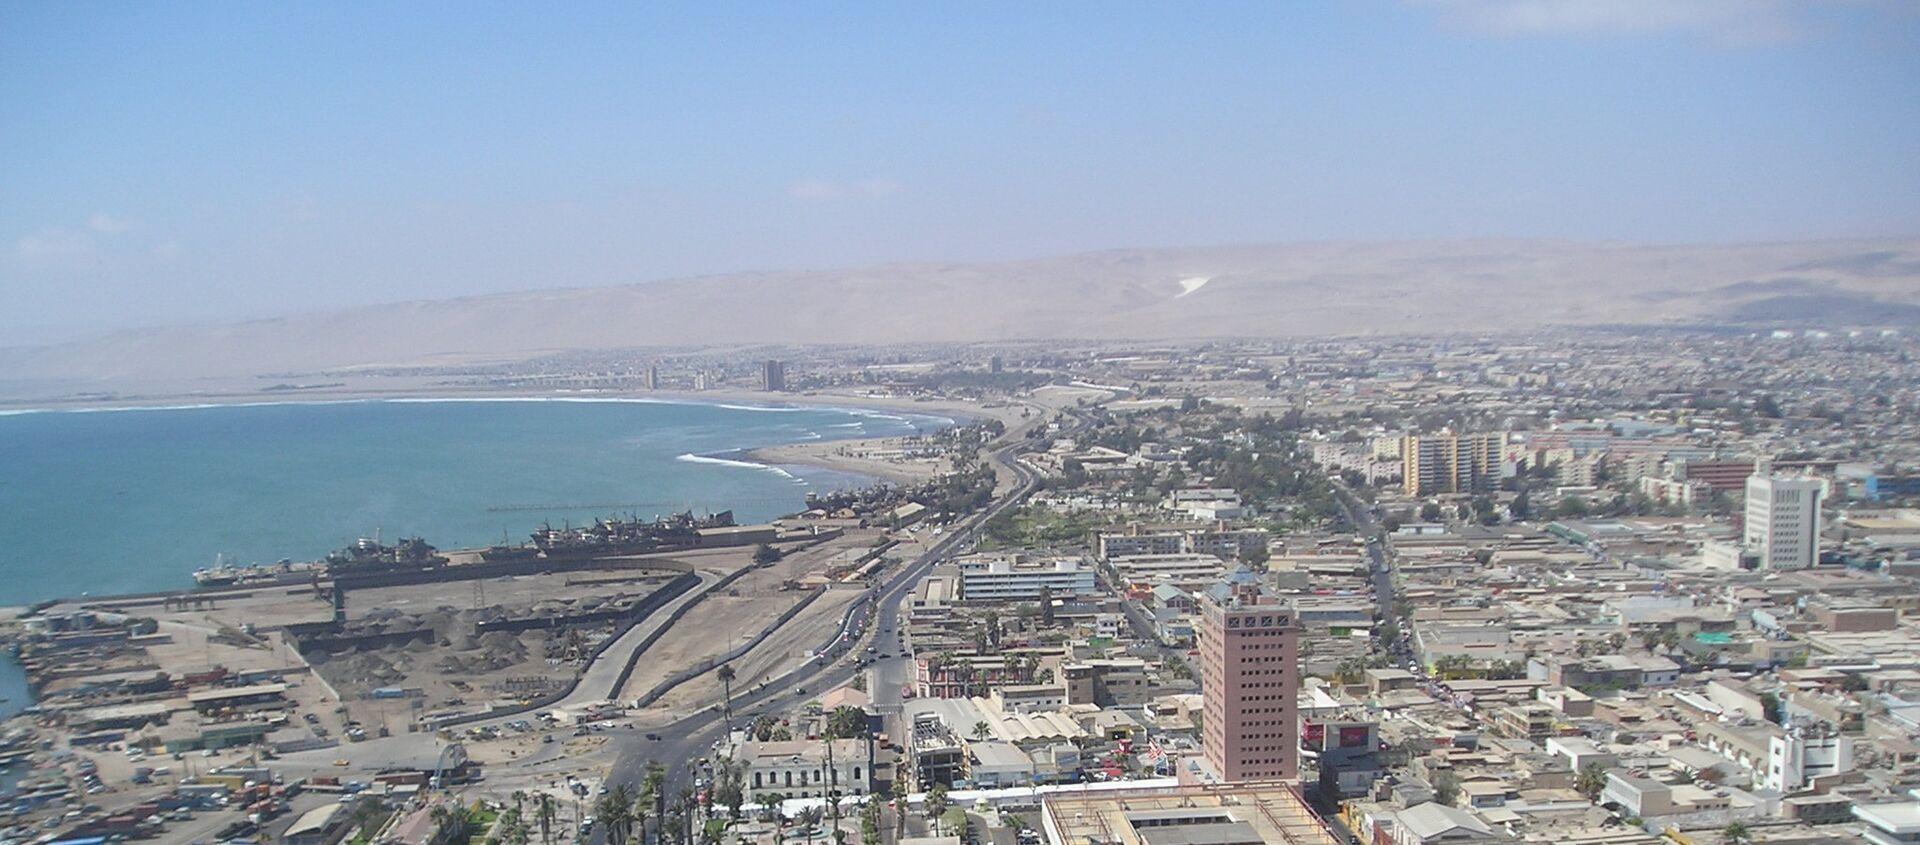 La ciudad puerto de Arica, Chile - Sputnik Mundo, 1920, 26.09.2018